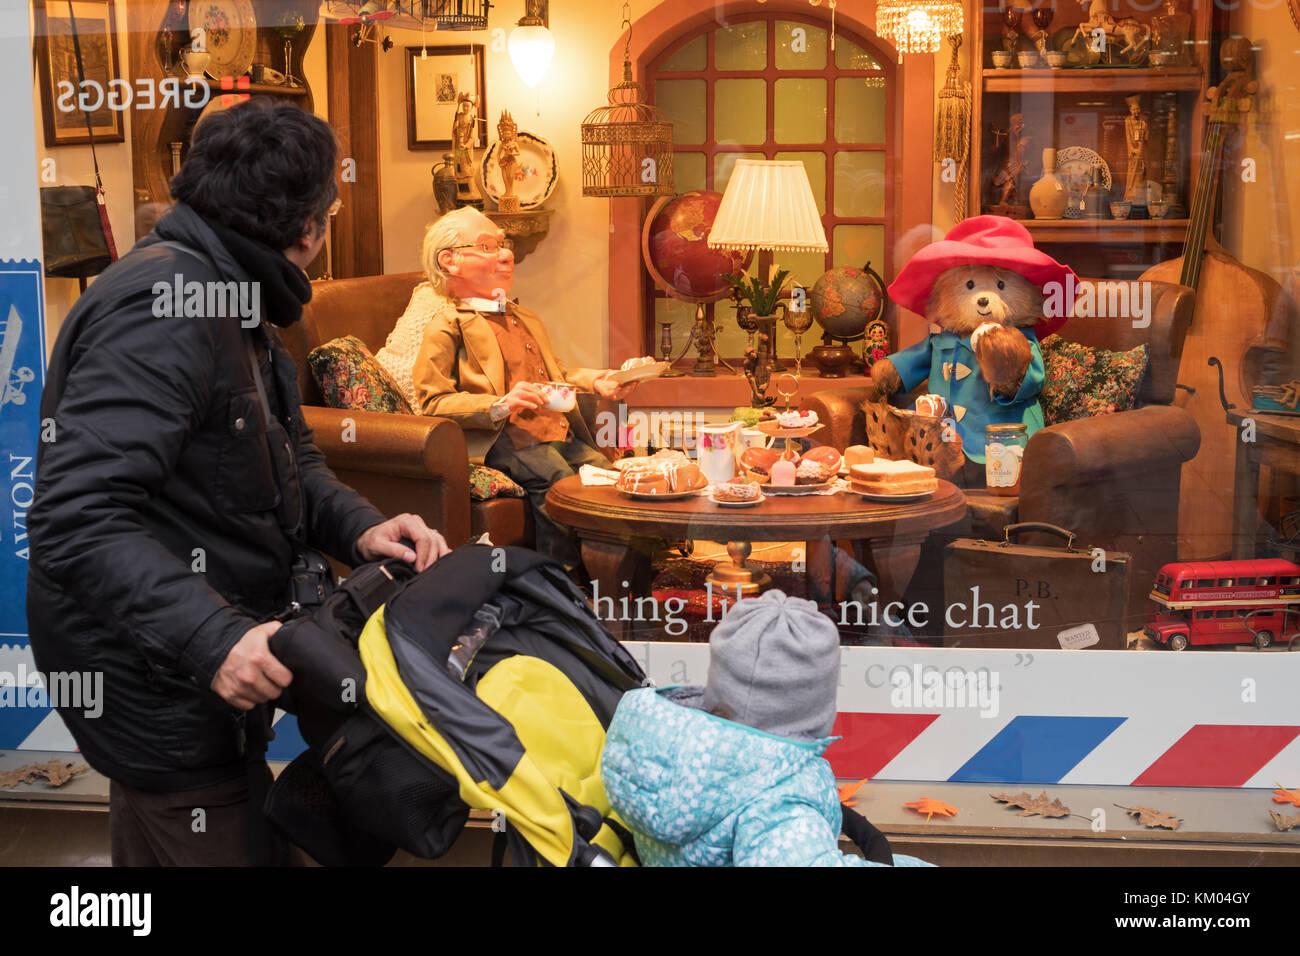 people-looking-at-fenwicks-2017-paddington-bear-christmas-display-KM04GY.jpg